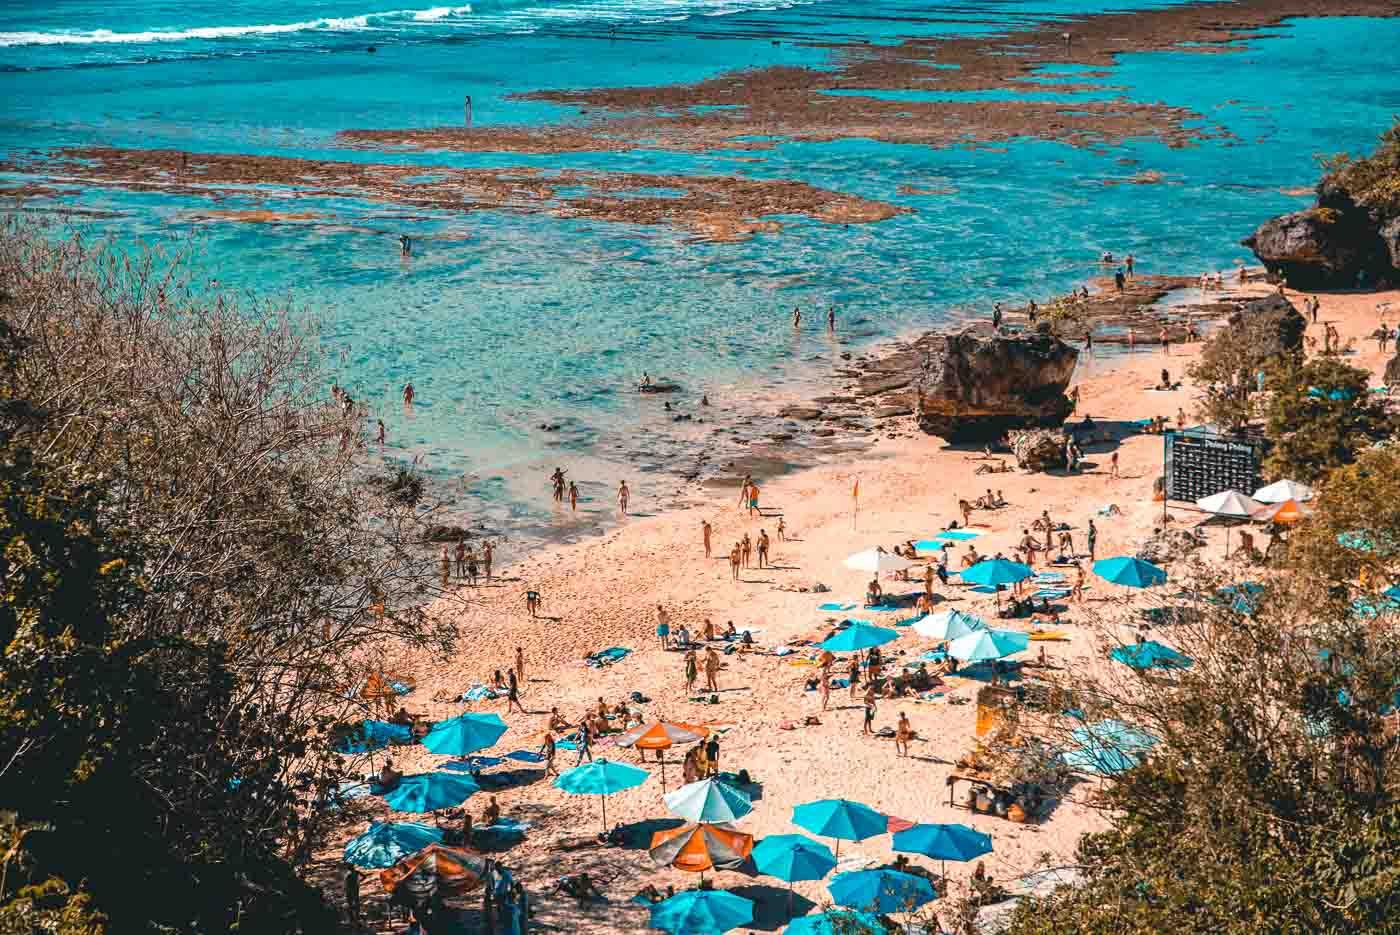 Padang Padang Beach - Bali Itinerary